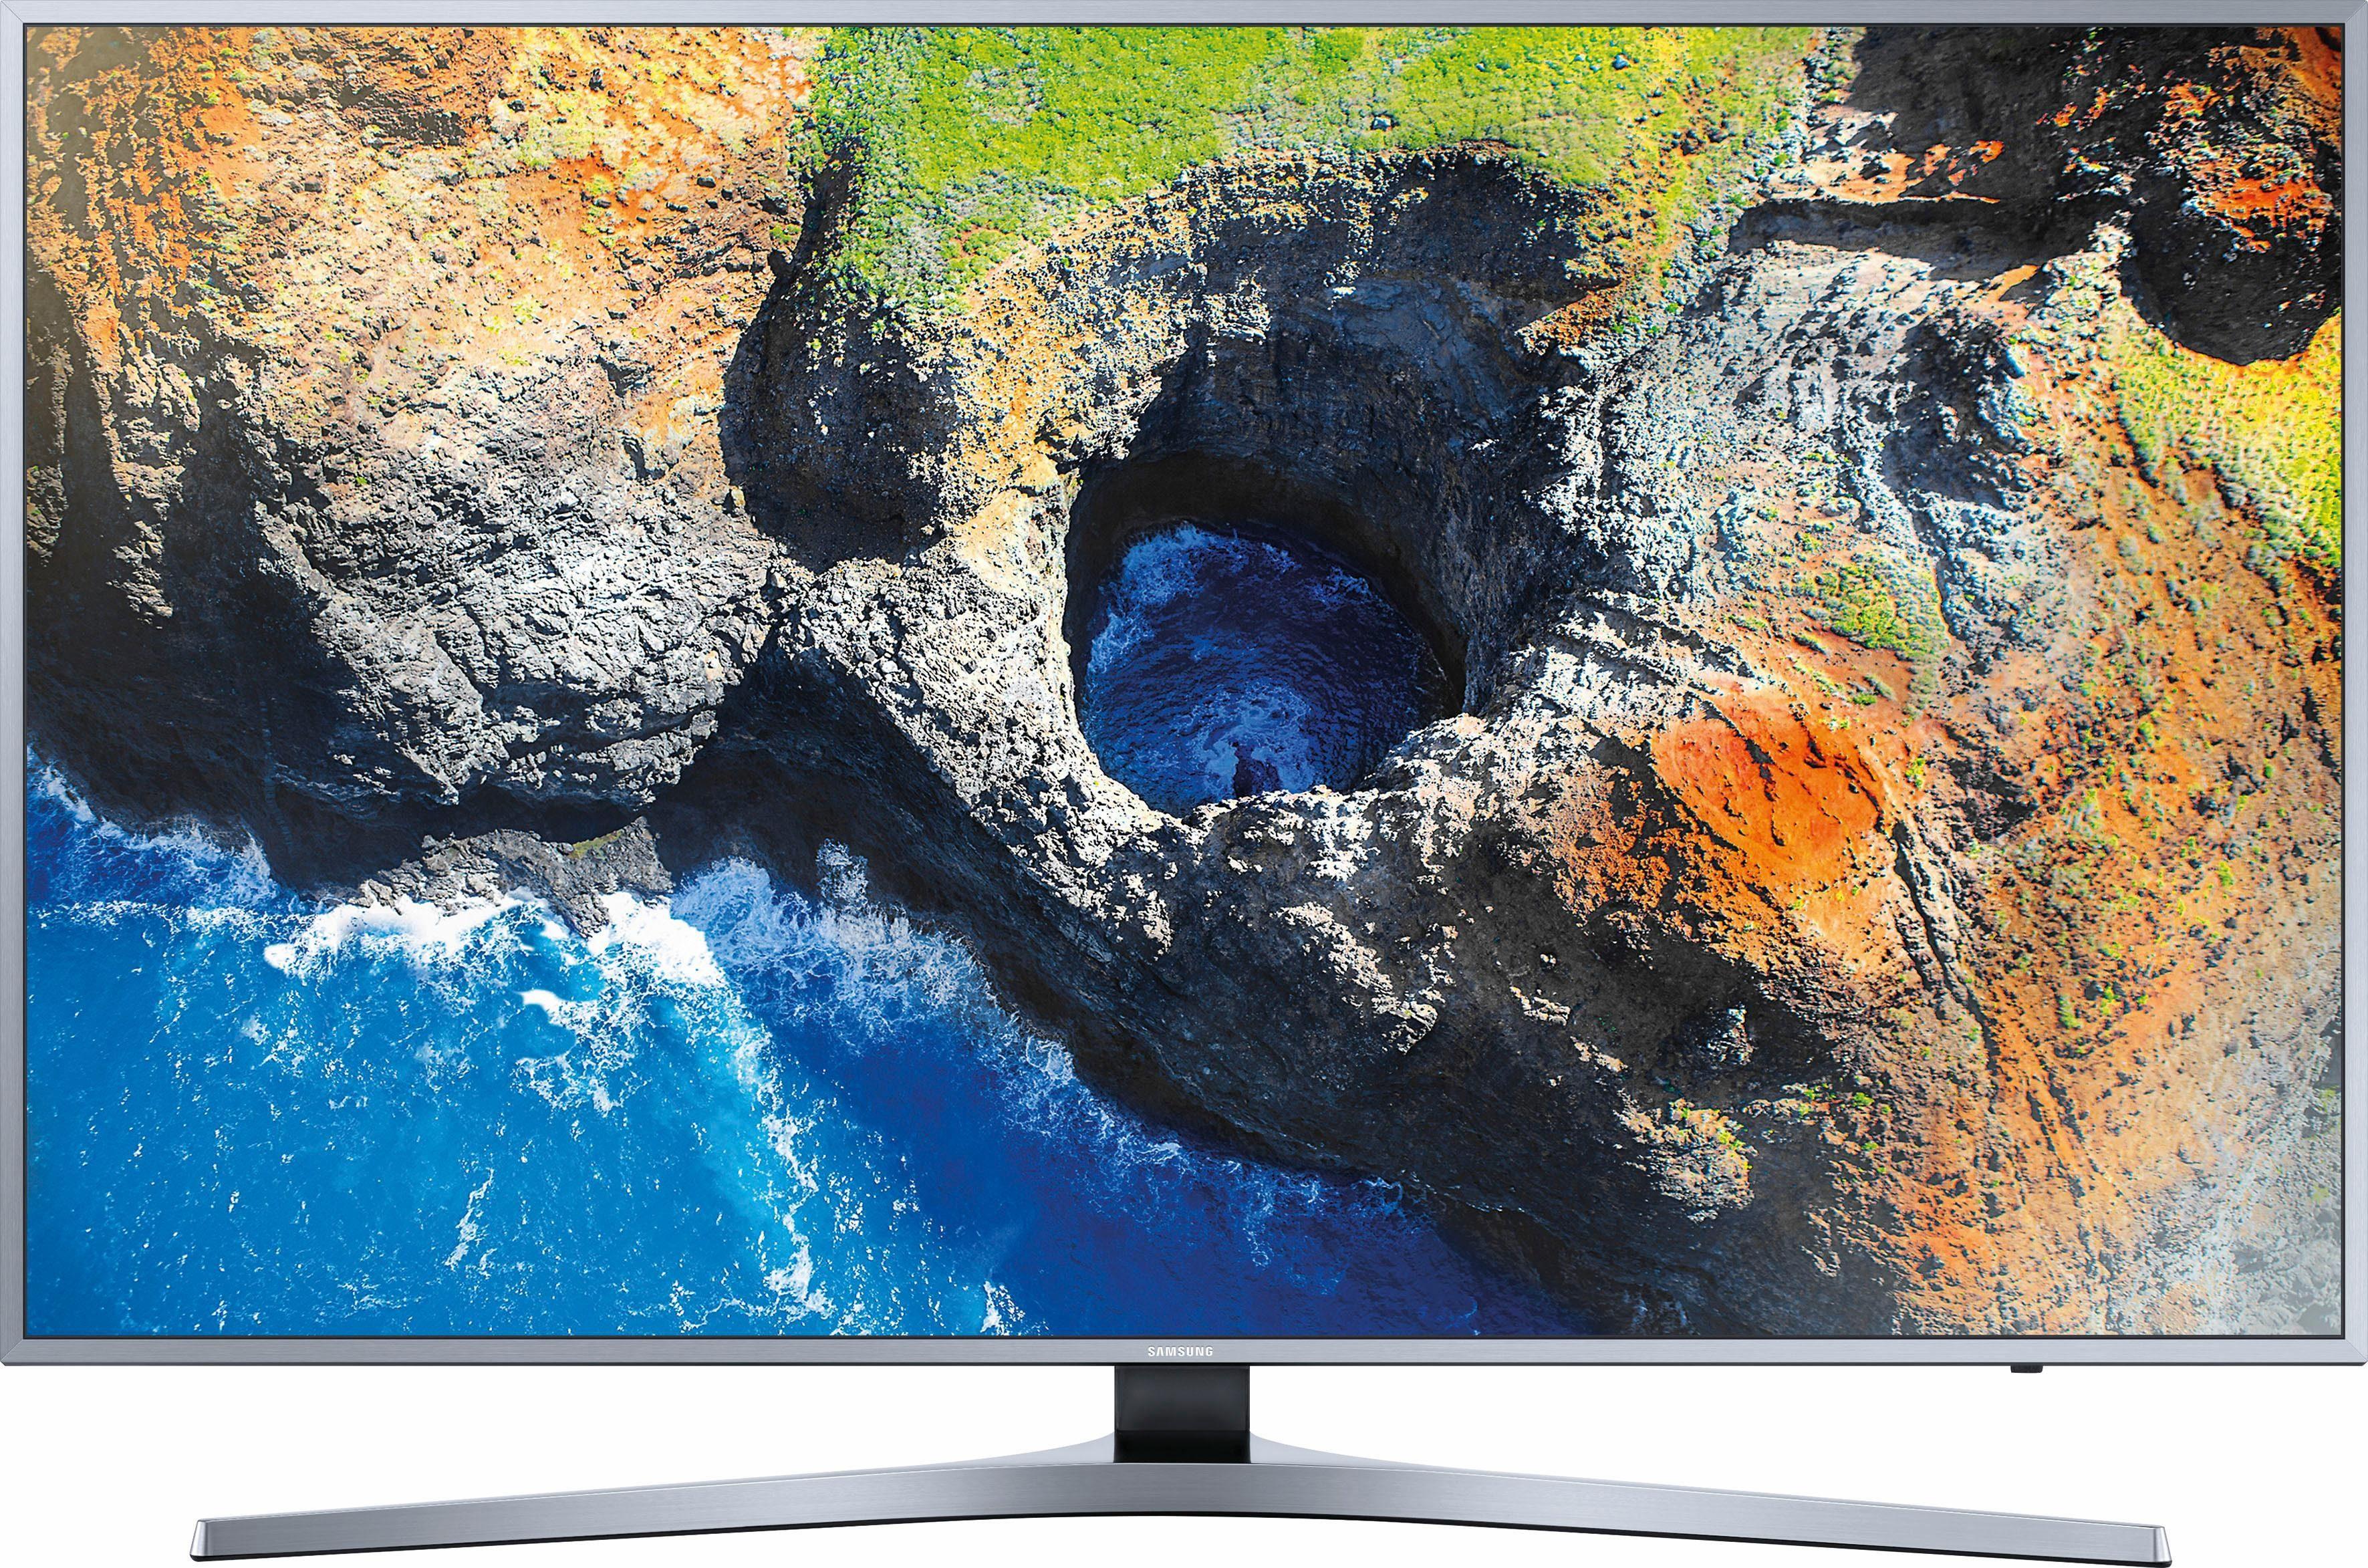 Samsung UE65MU6409UXZG LED-Fernseher (65 Zoll, 4K Ultra HD, Smart-TV, 360° Video Player)